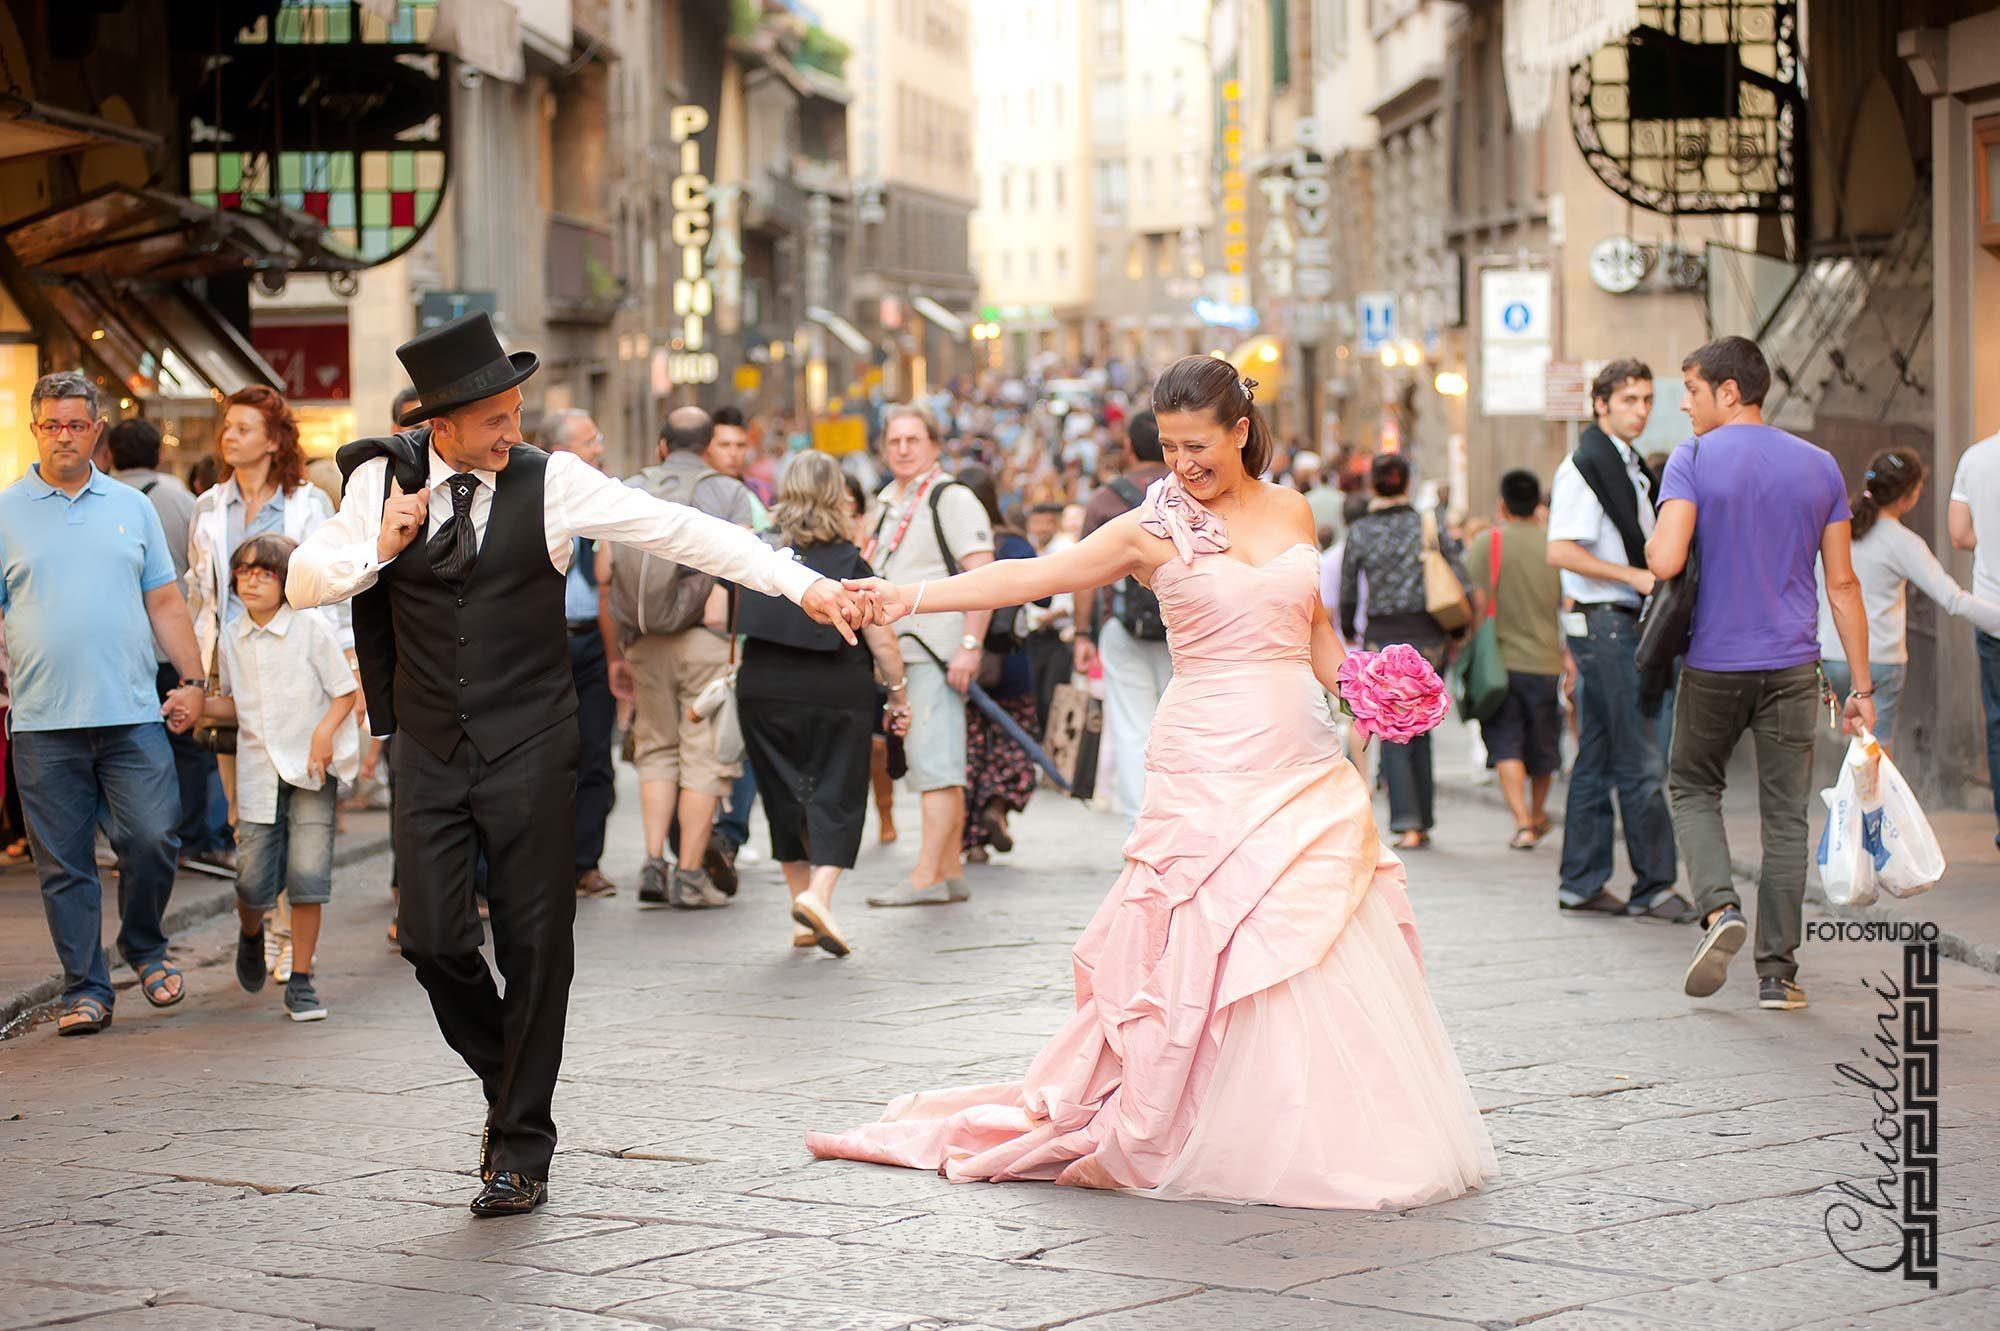 Matrimonio a Firenze, Katiuscia e Toni, Ponte Vecchio, foto matrimonio Firenze